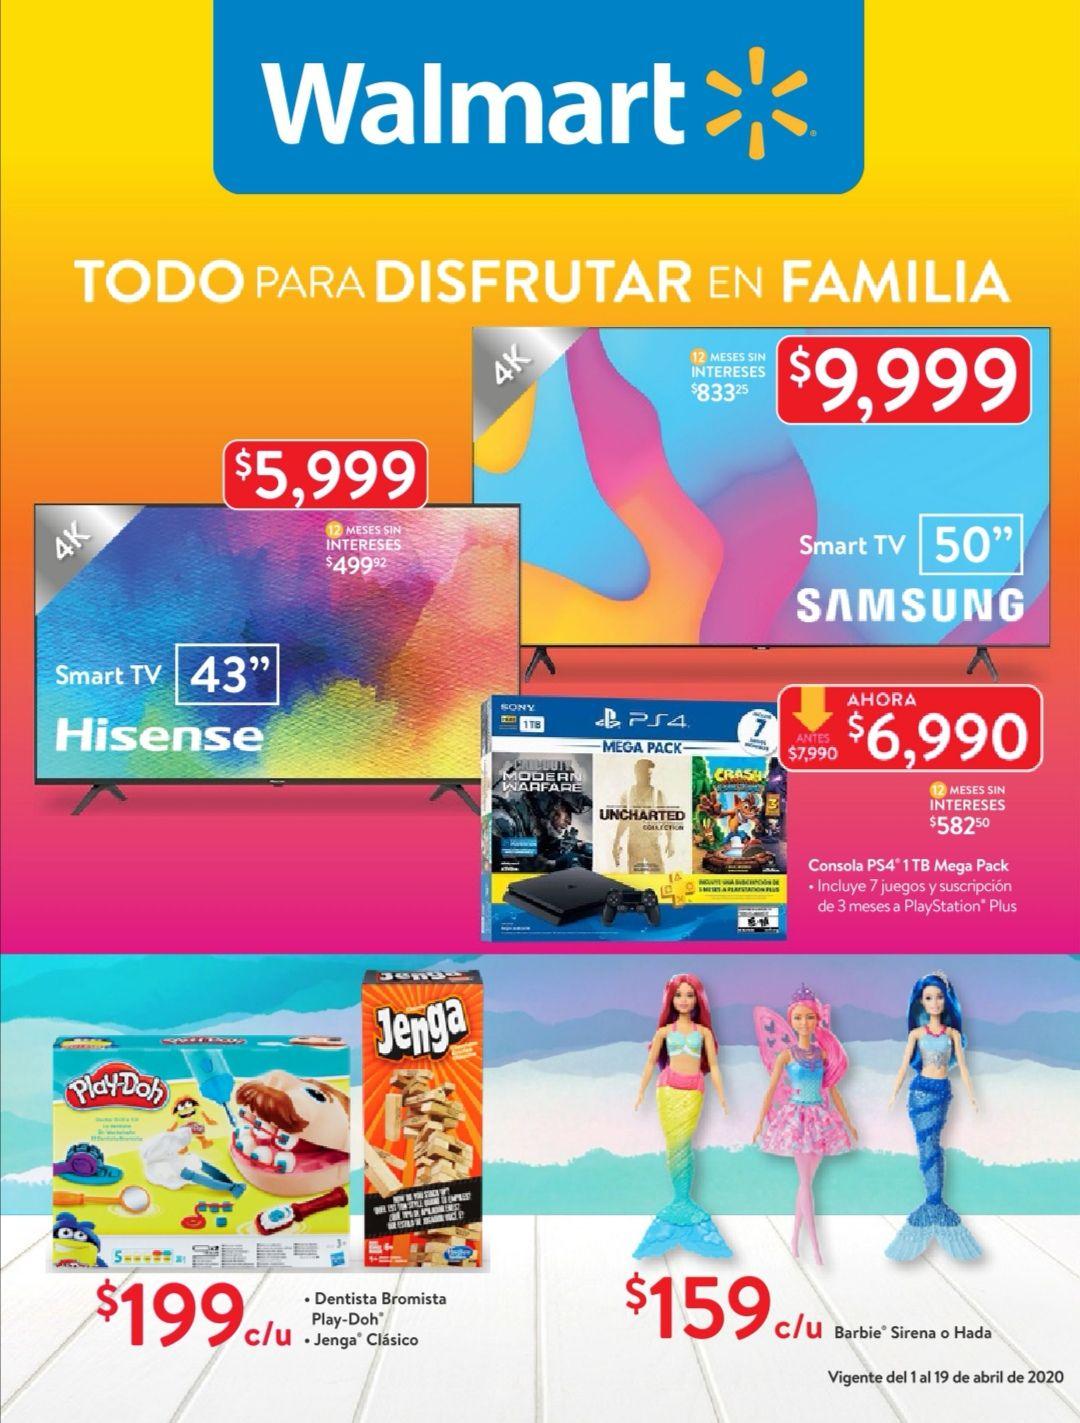 Walmart: Folleto de Ofertas Quincenal del Miércoles 1 al Domingo 19 de Abril